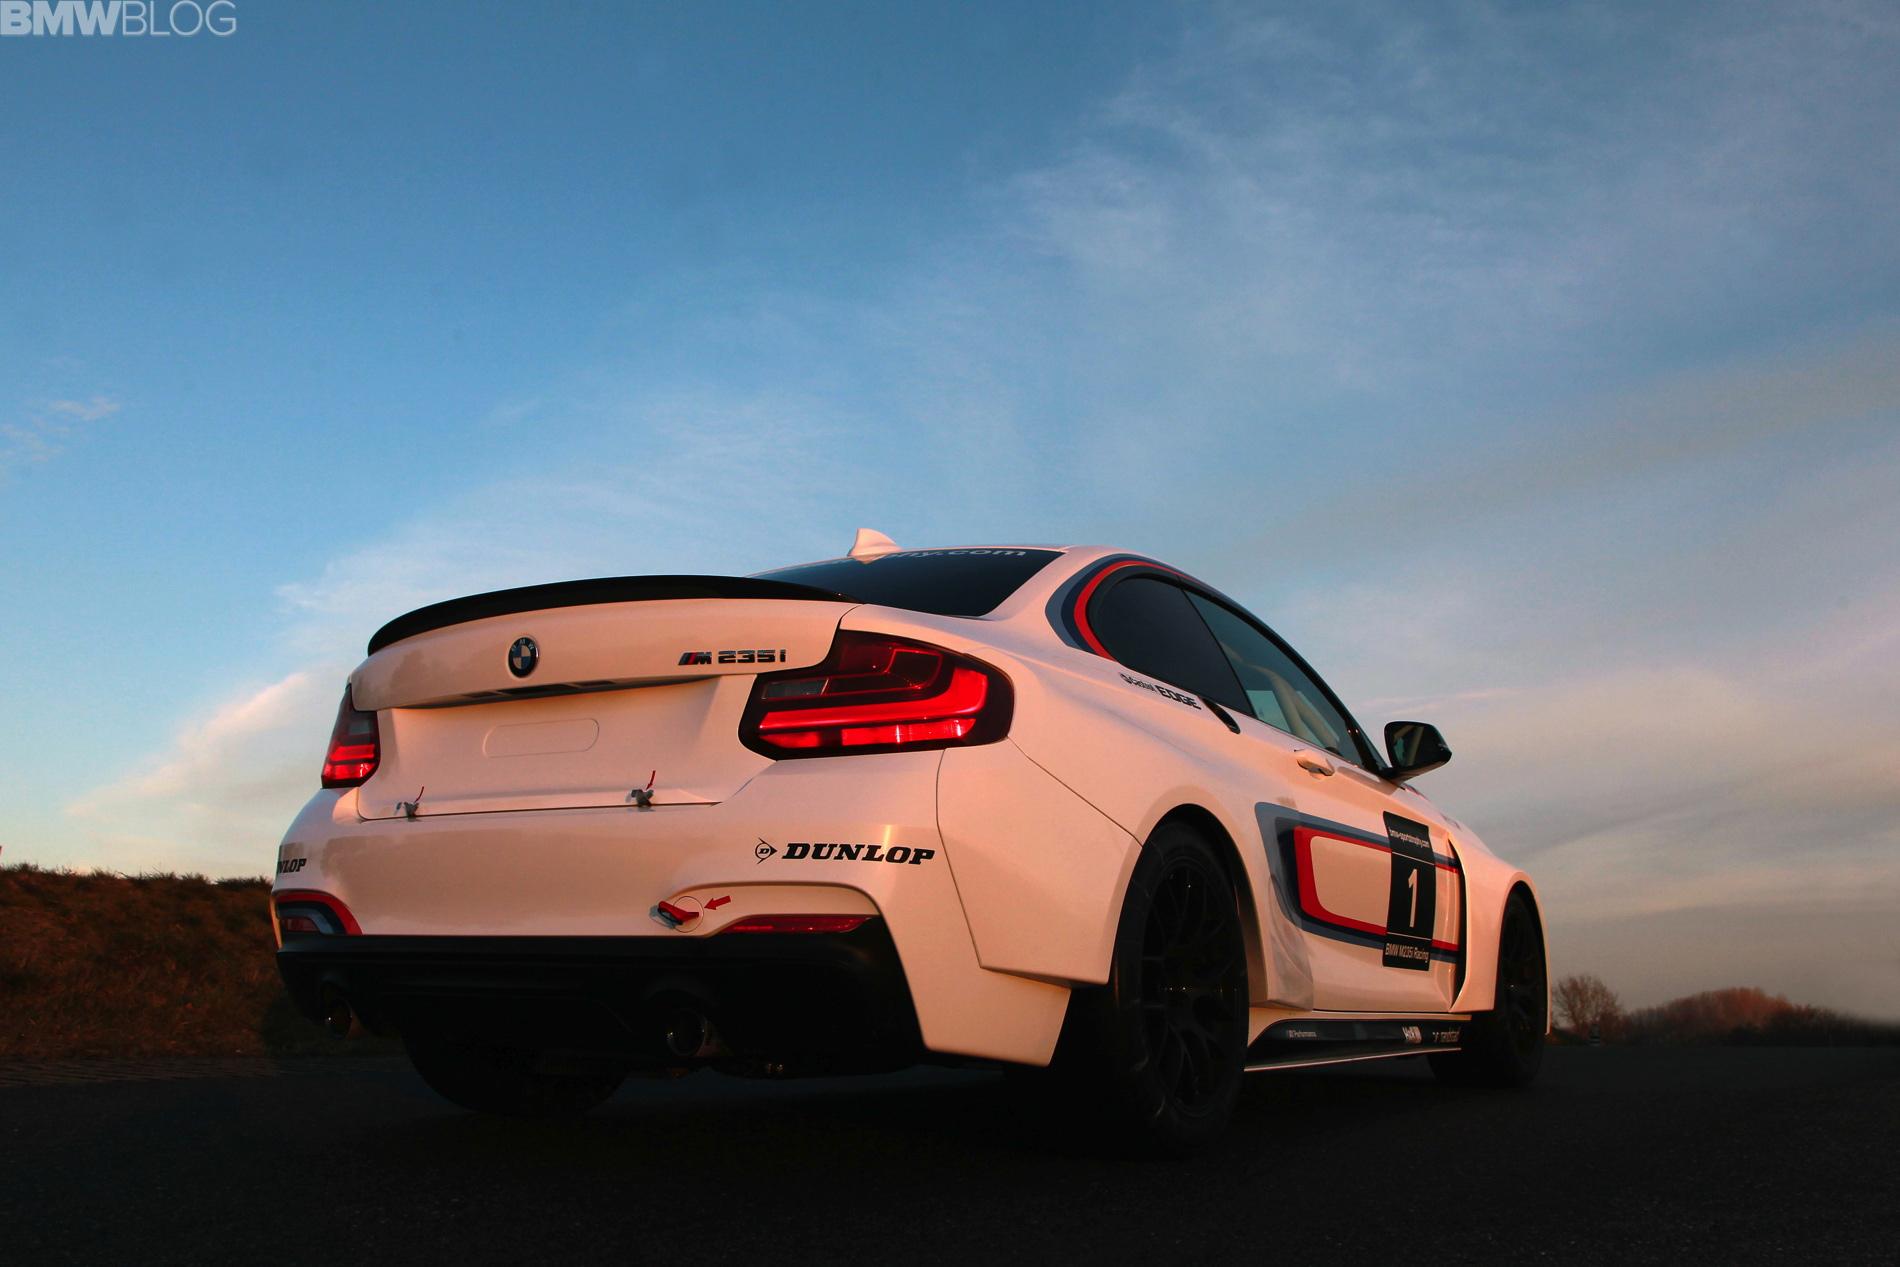 m235i racing 01